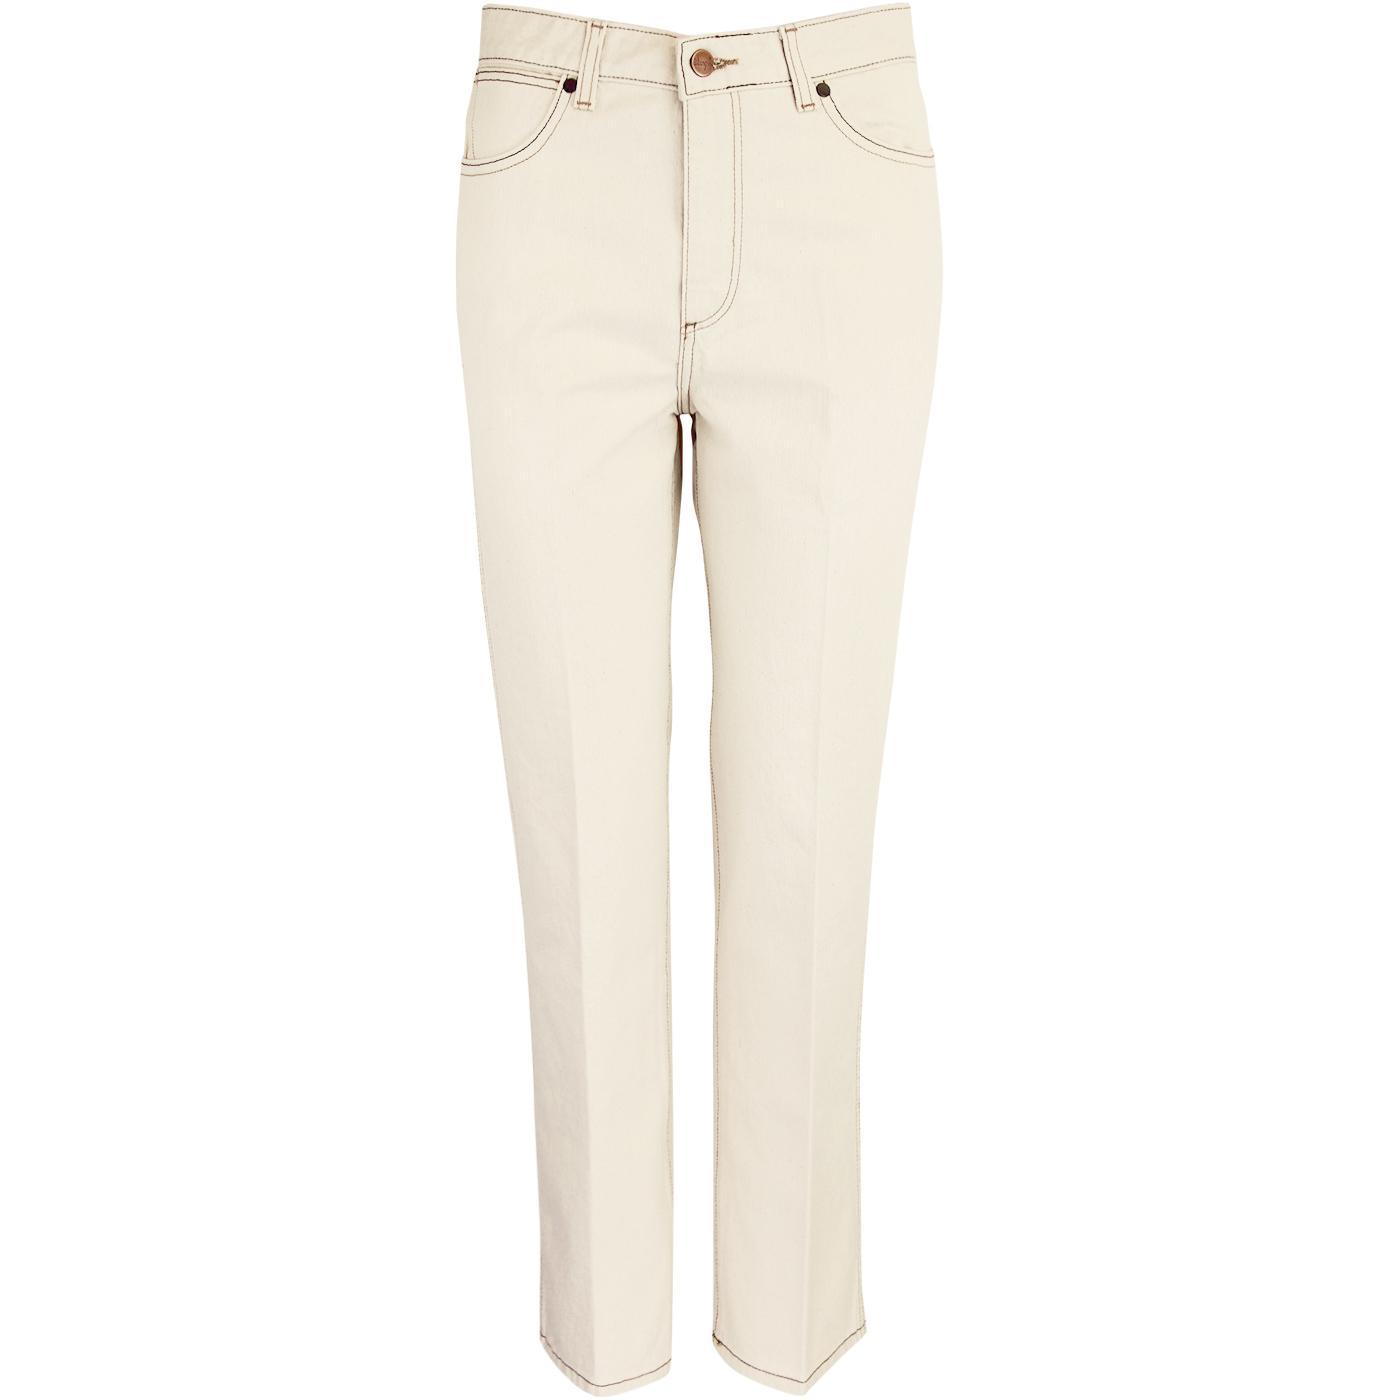 WRANGLER Retro Straight Denim Jeans (Natural Sand)